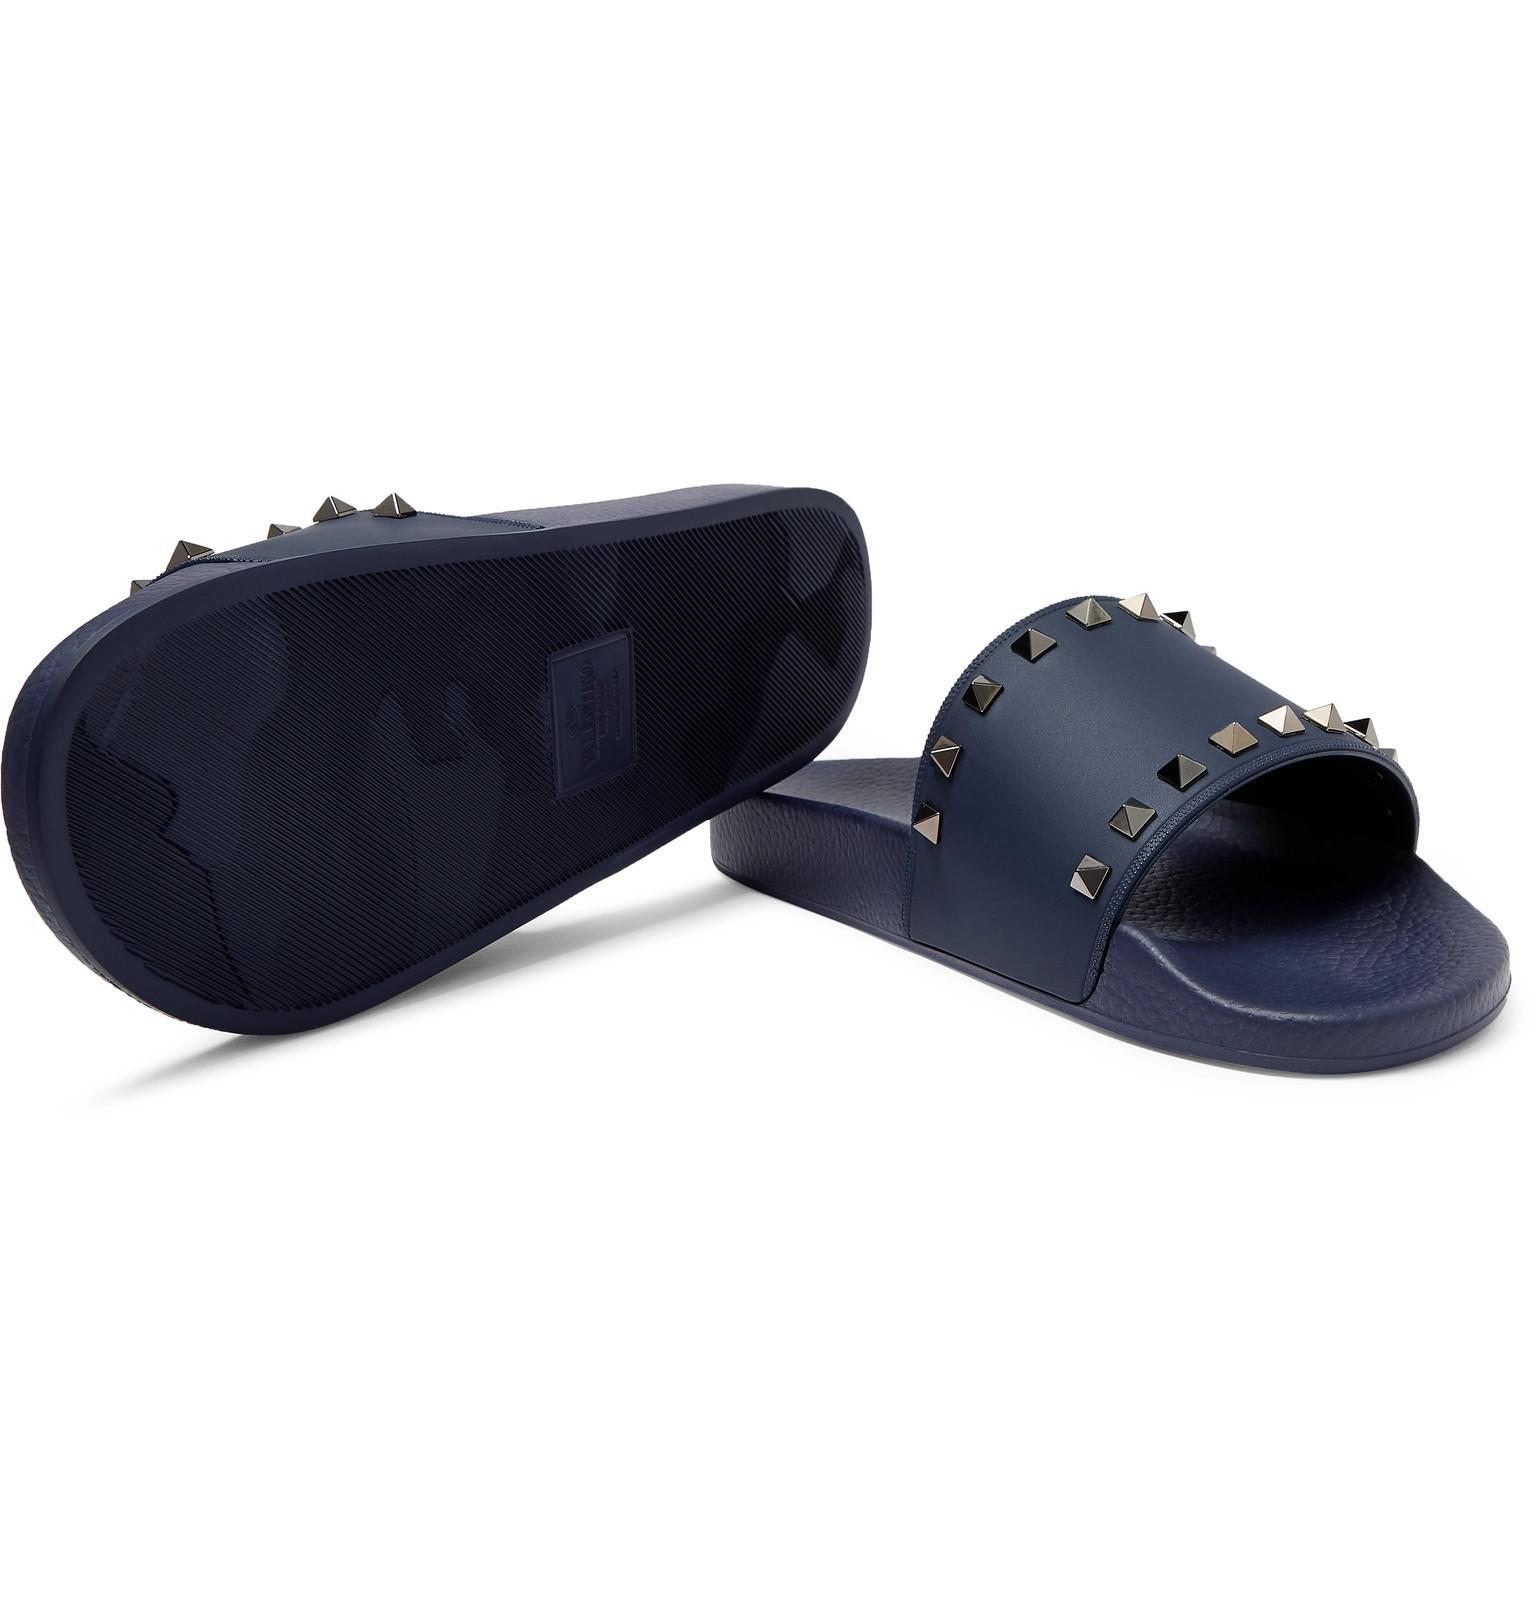 90d95945caa Valentino - Blue Garavani Rockstud Rubber Slides for Men - Lyst. View  fullscreen